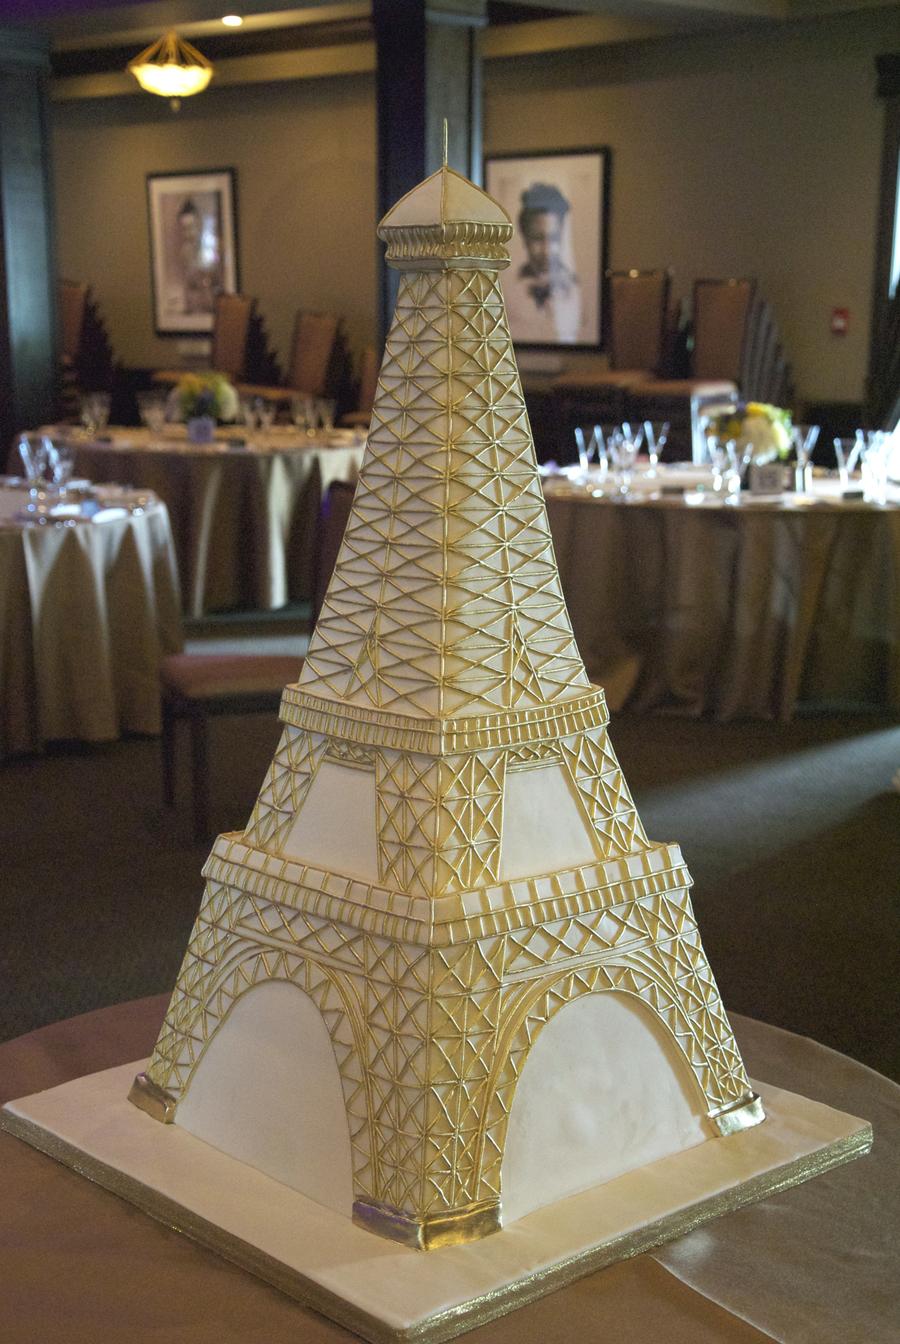 Eiffel Tower Wedding Cake - CakeCentral.com